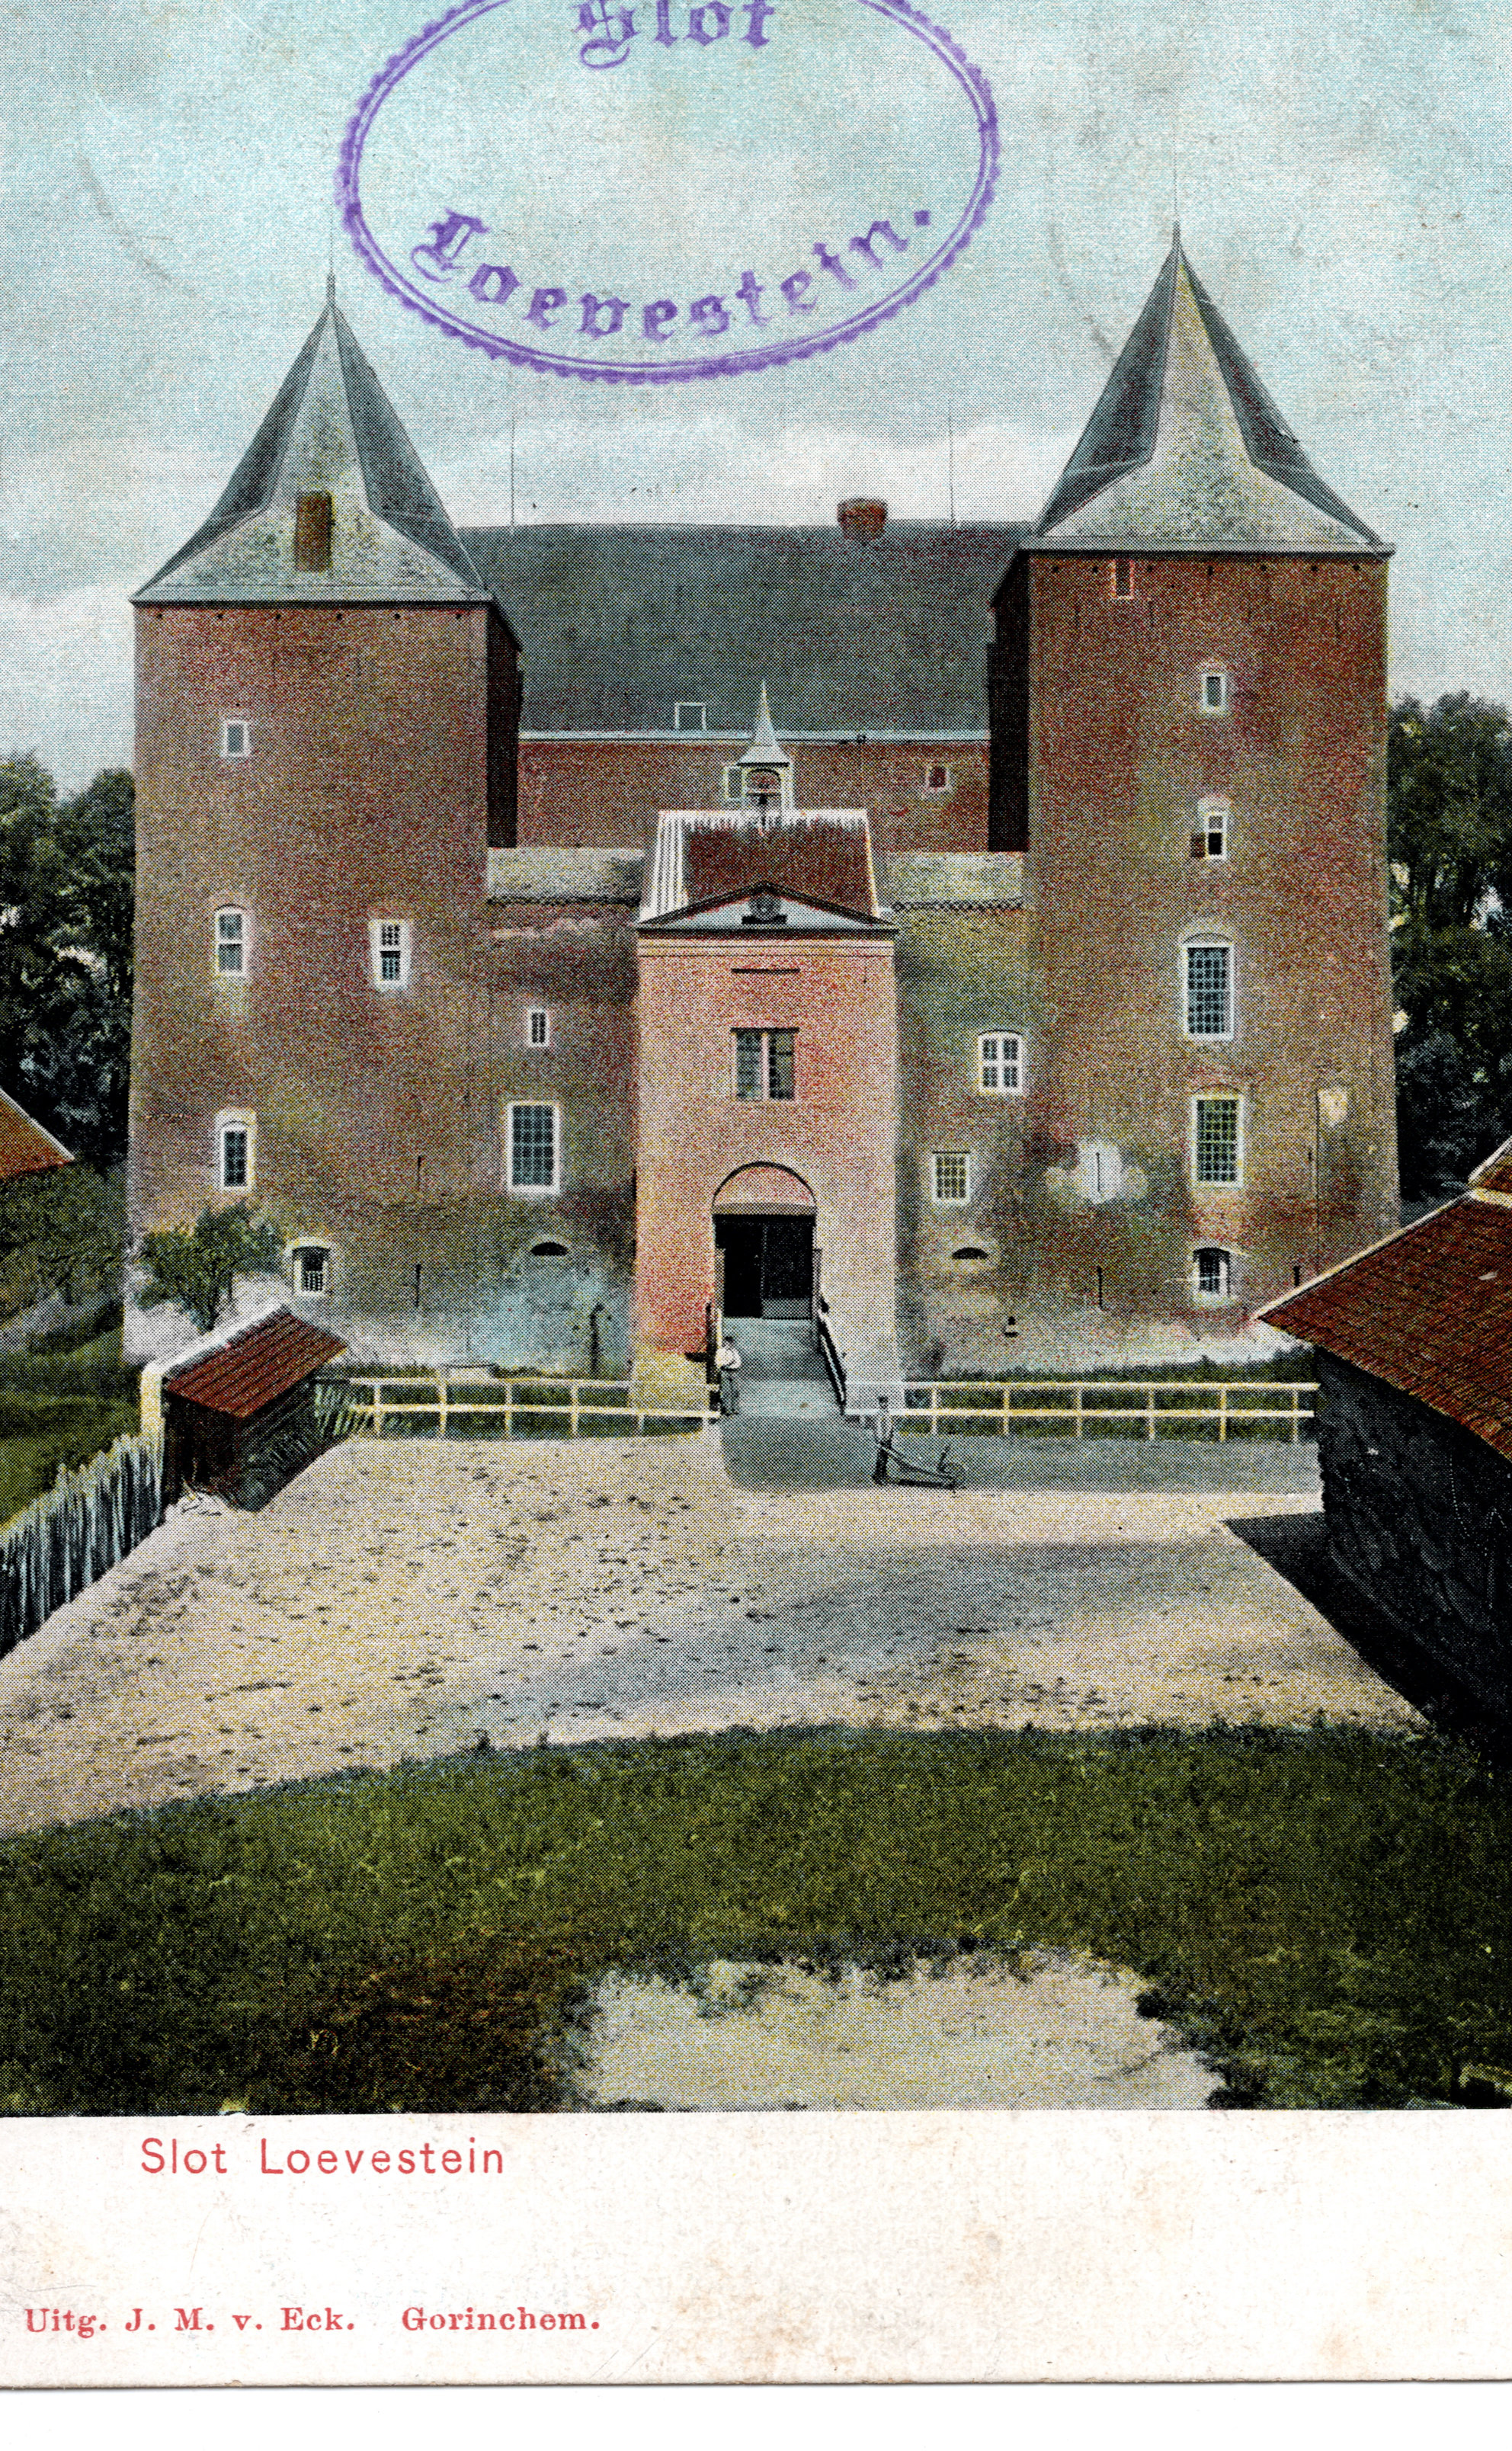 A9-Slot-Loevestein-1907